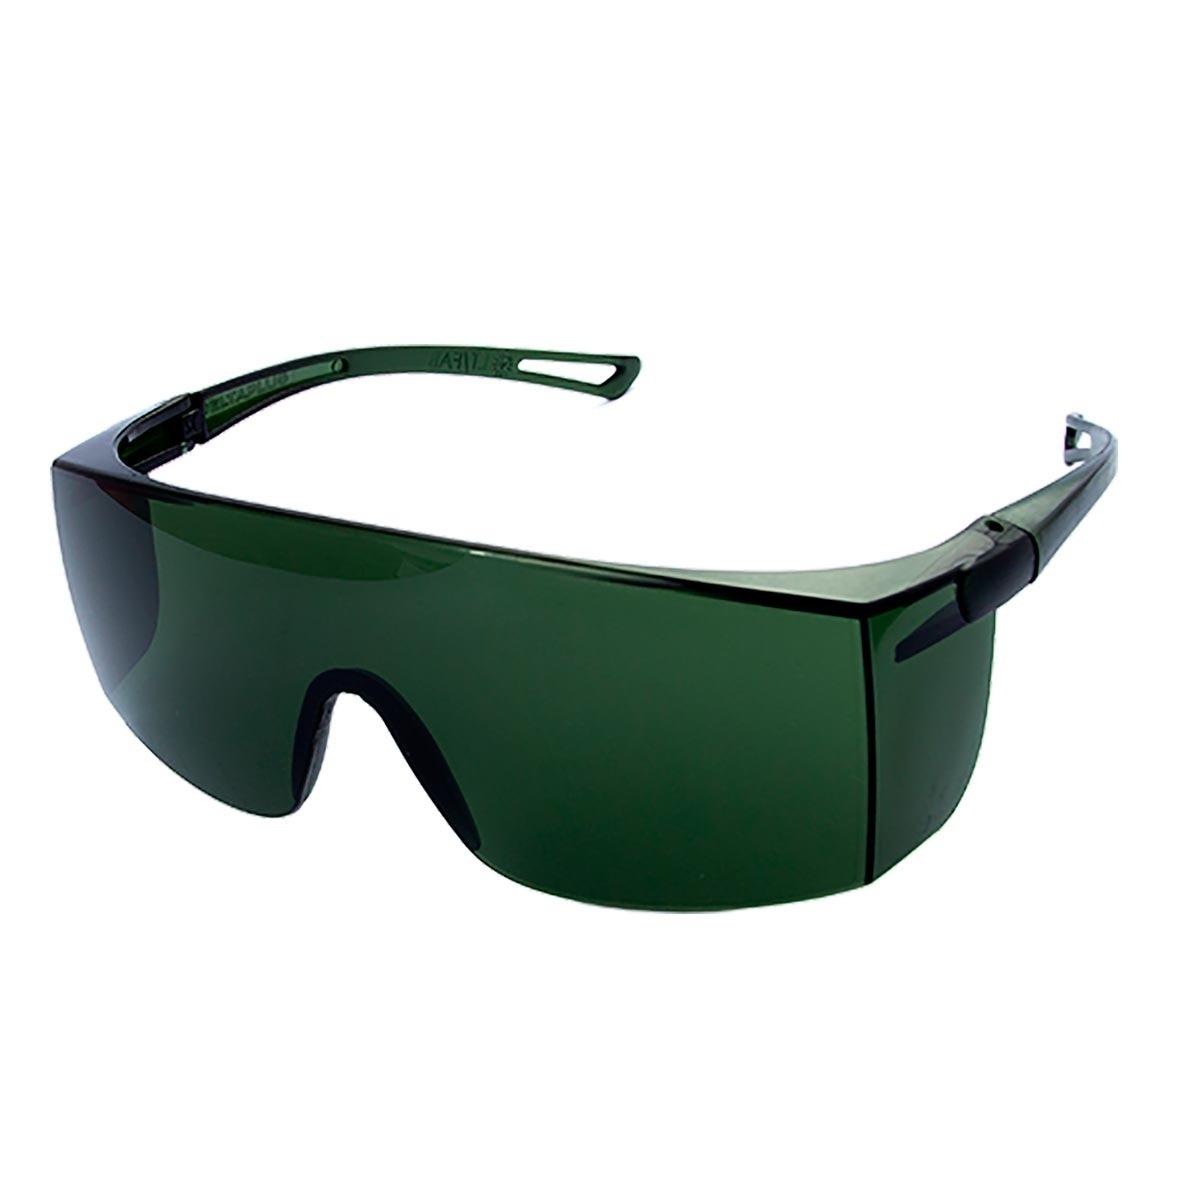 9f3602d785978 óculos de proteção delta plus sky rayban - ca 39.878. Carregando zoom.